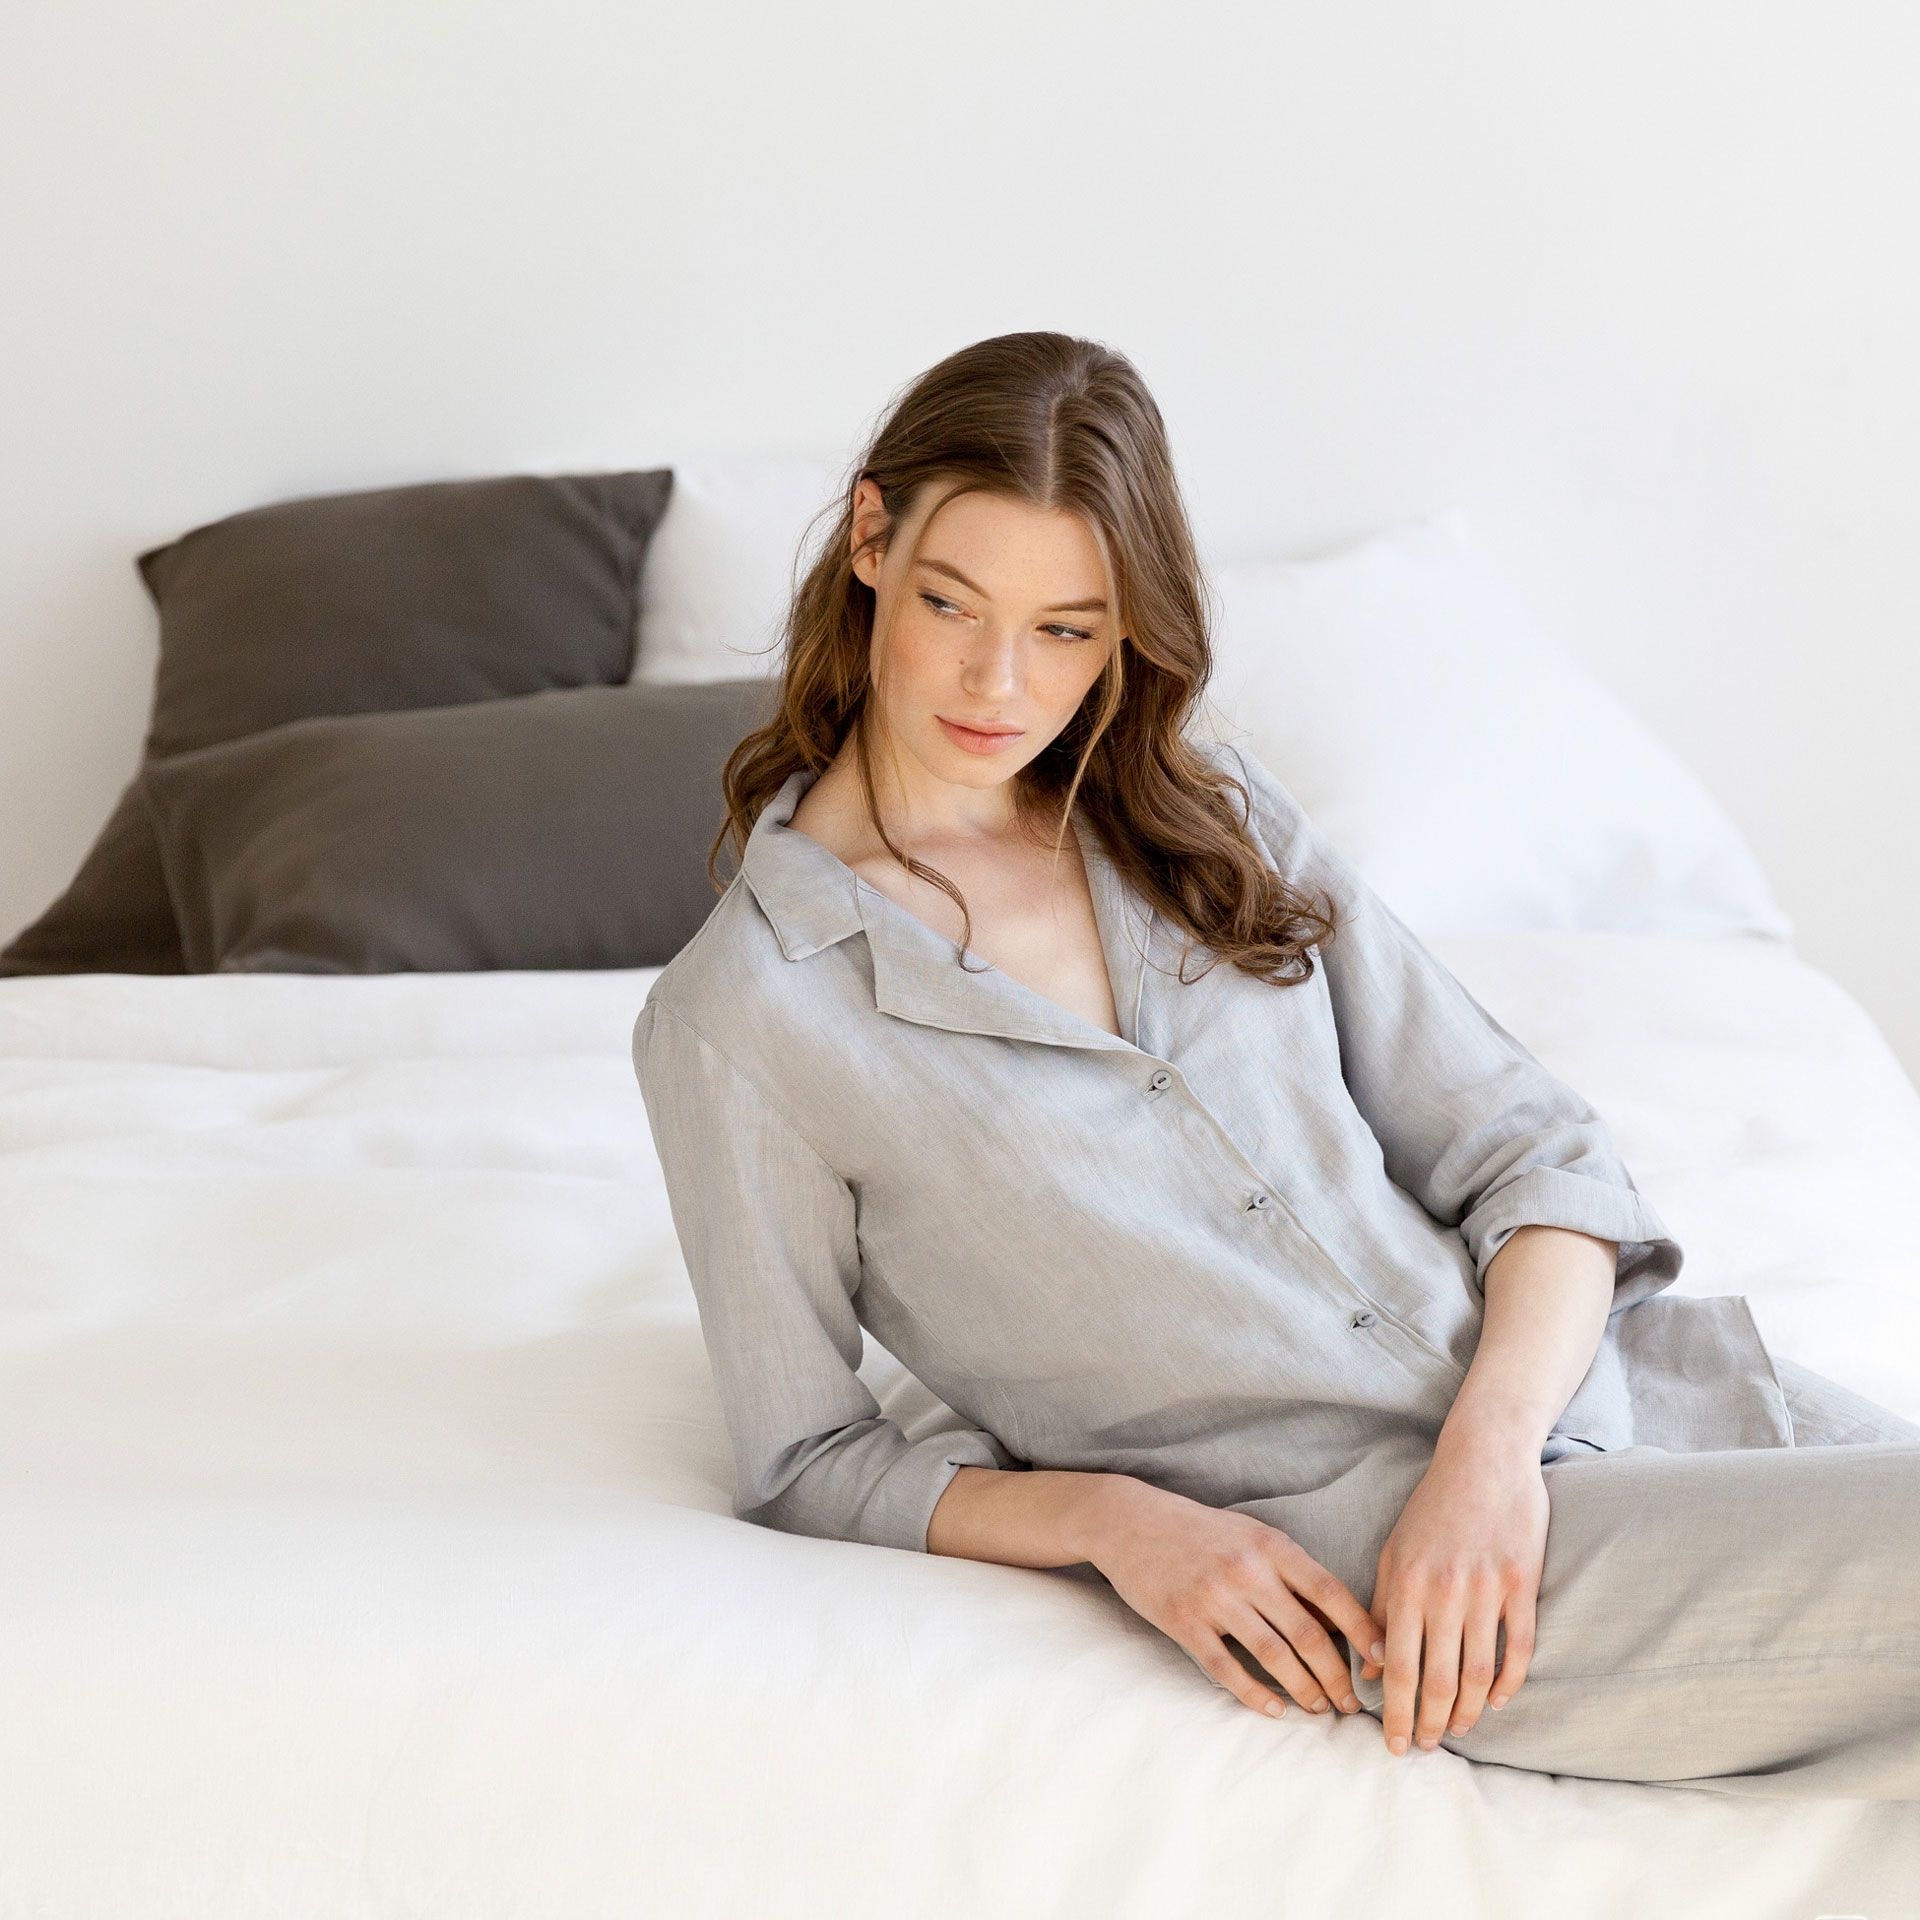 grey linen shirt - clothing - woman